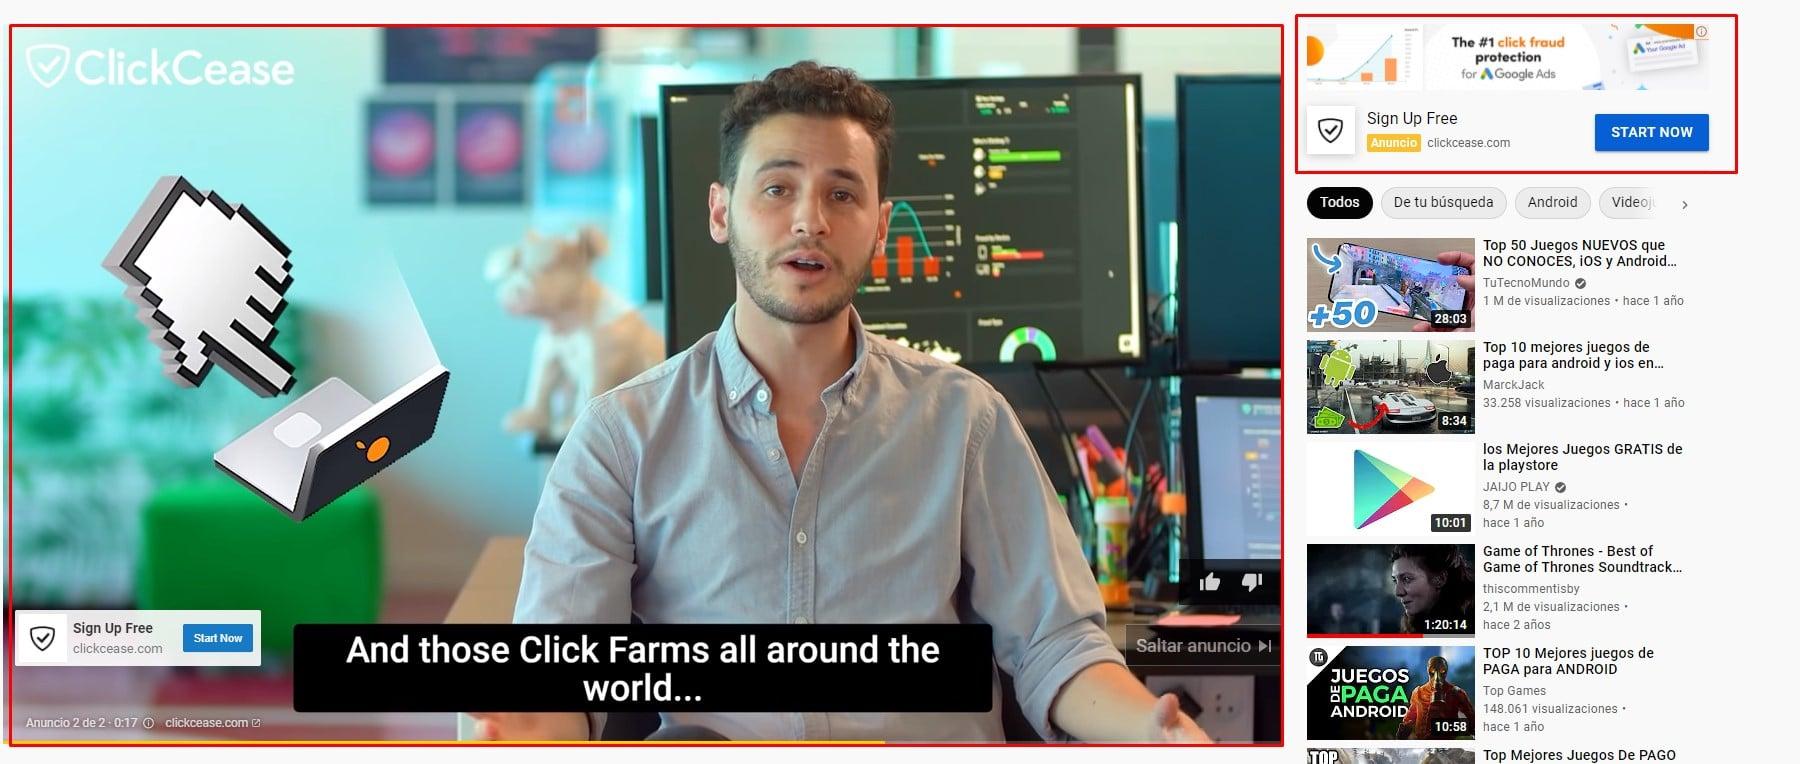 campañas google ads - video